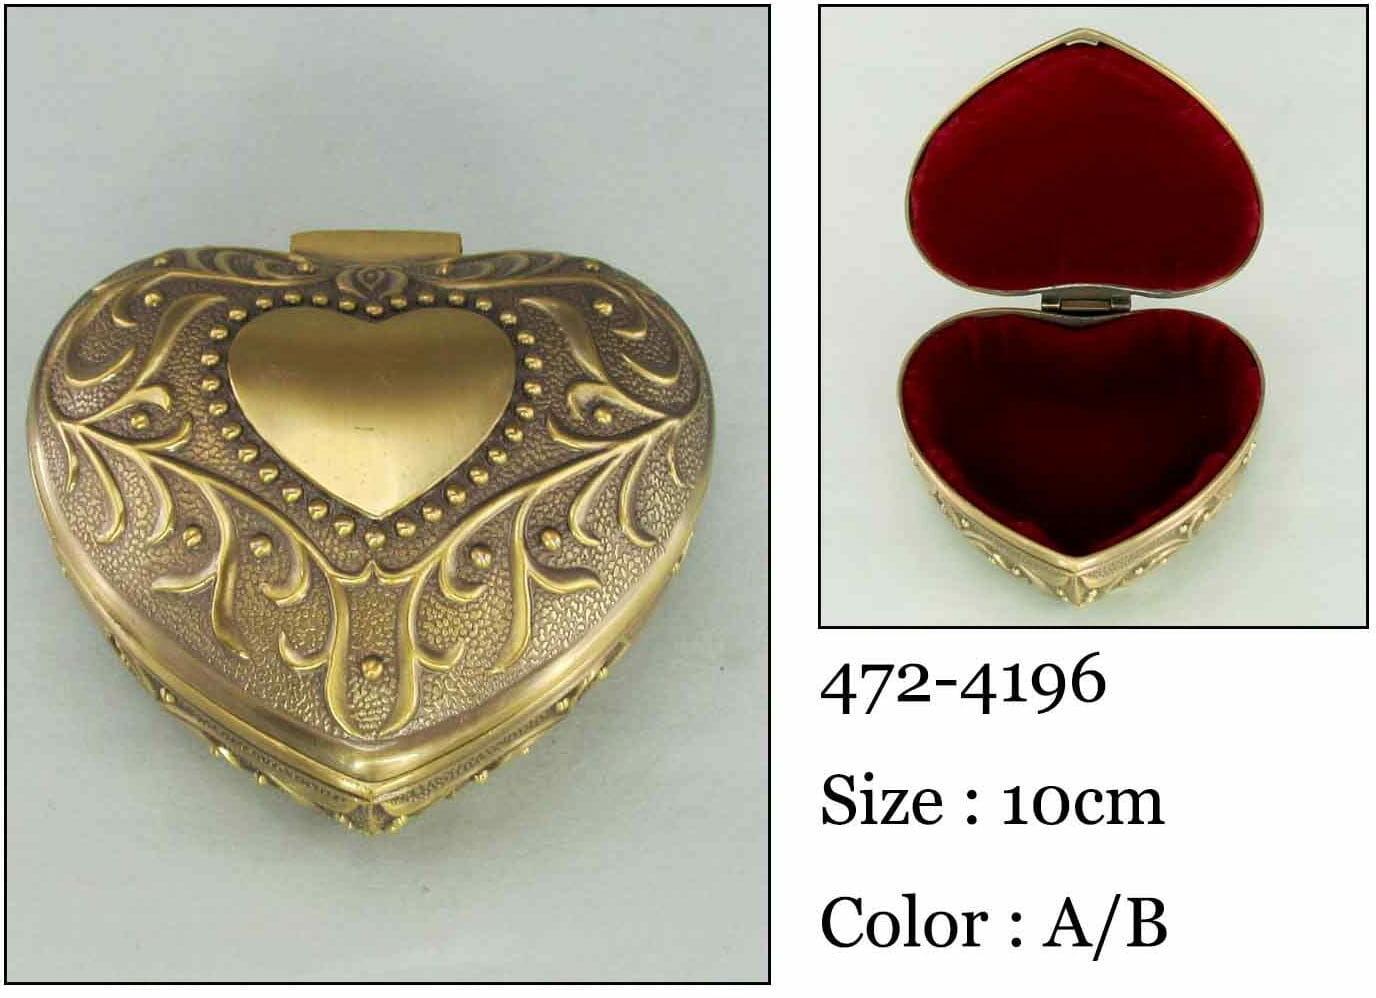 Kasetka, stare złoto, 9x9 cm